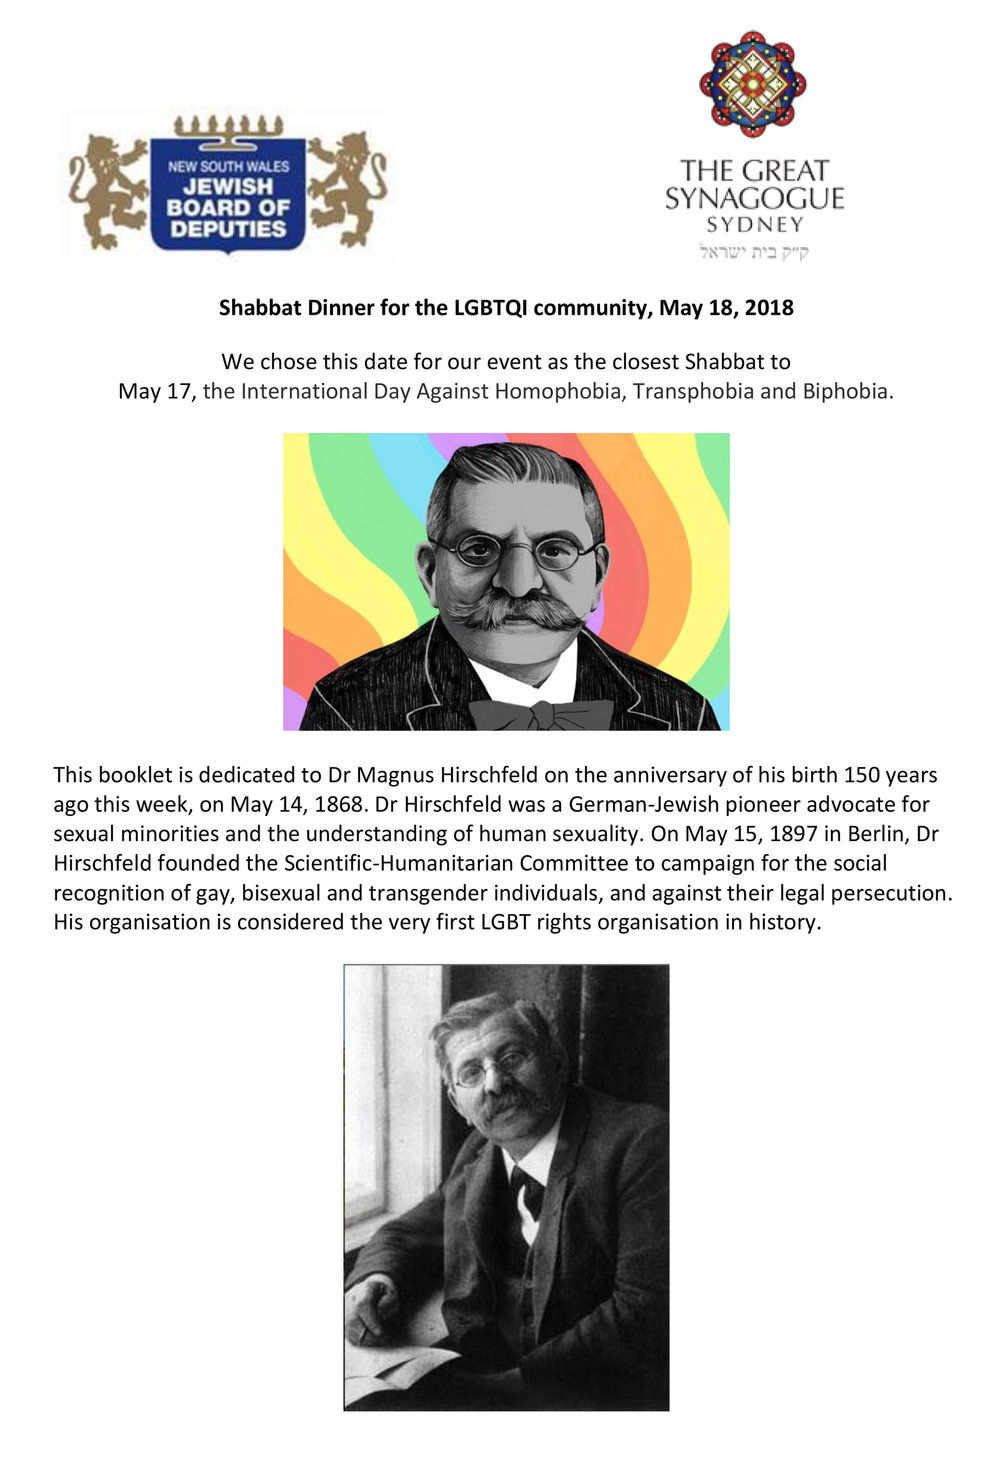 About-the-Sydney-Jewish-LGBTQI-community-1.jpg